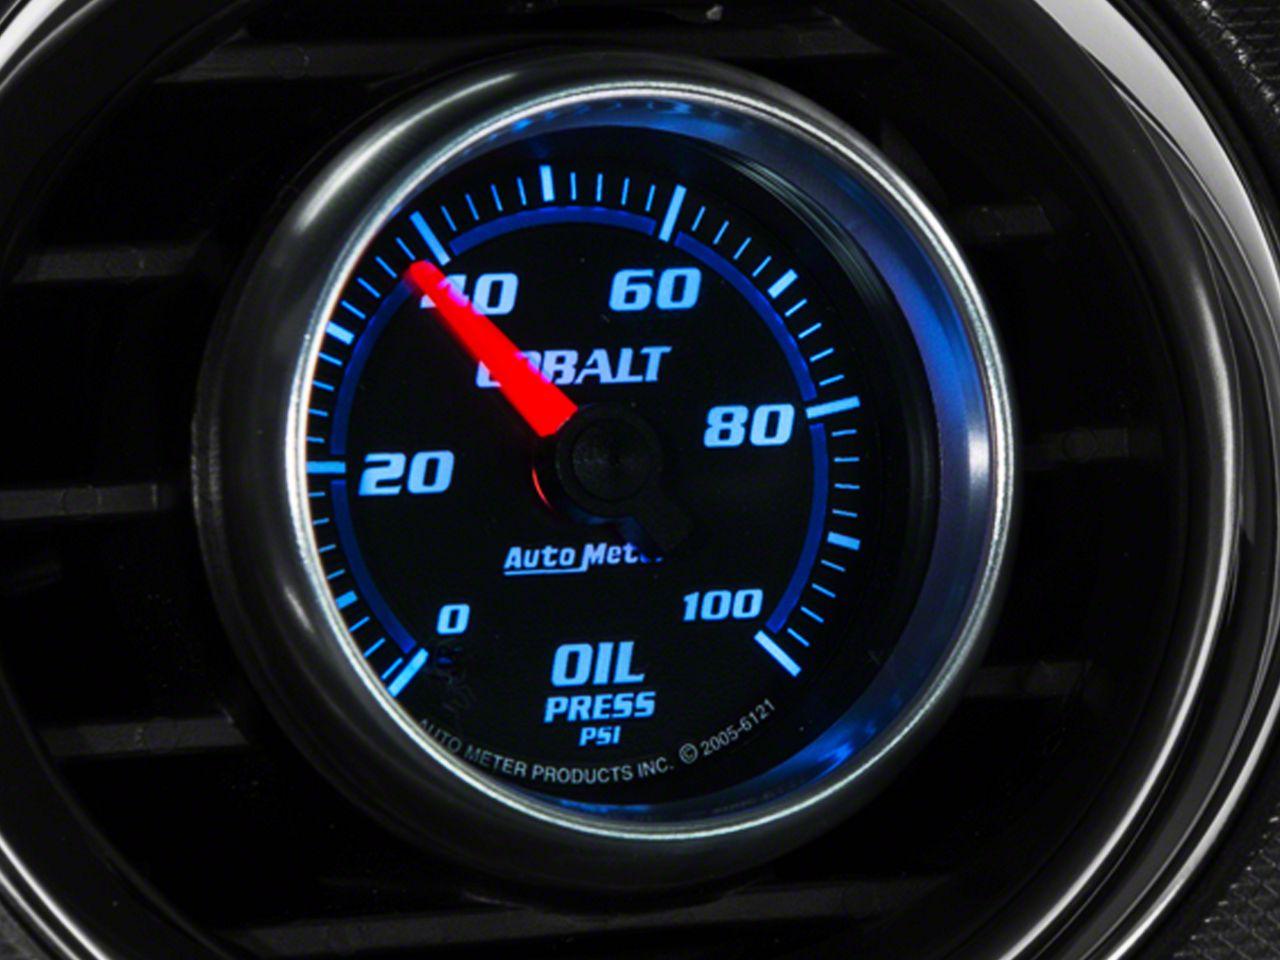 Auto Meter Cobalt Oil Pressure Gauge - Mechanical (08-18 All)